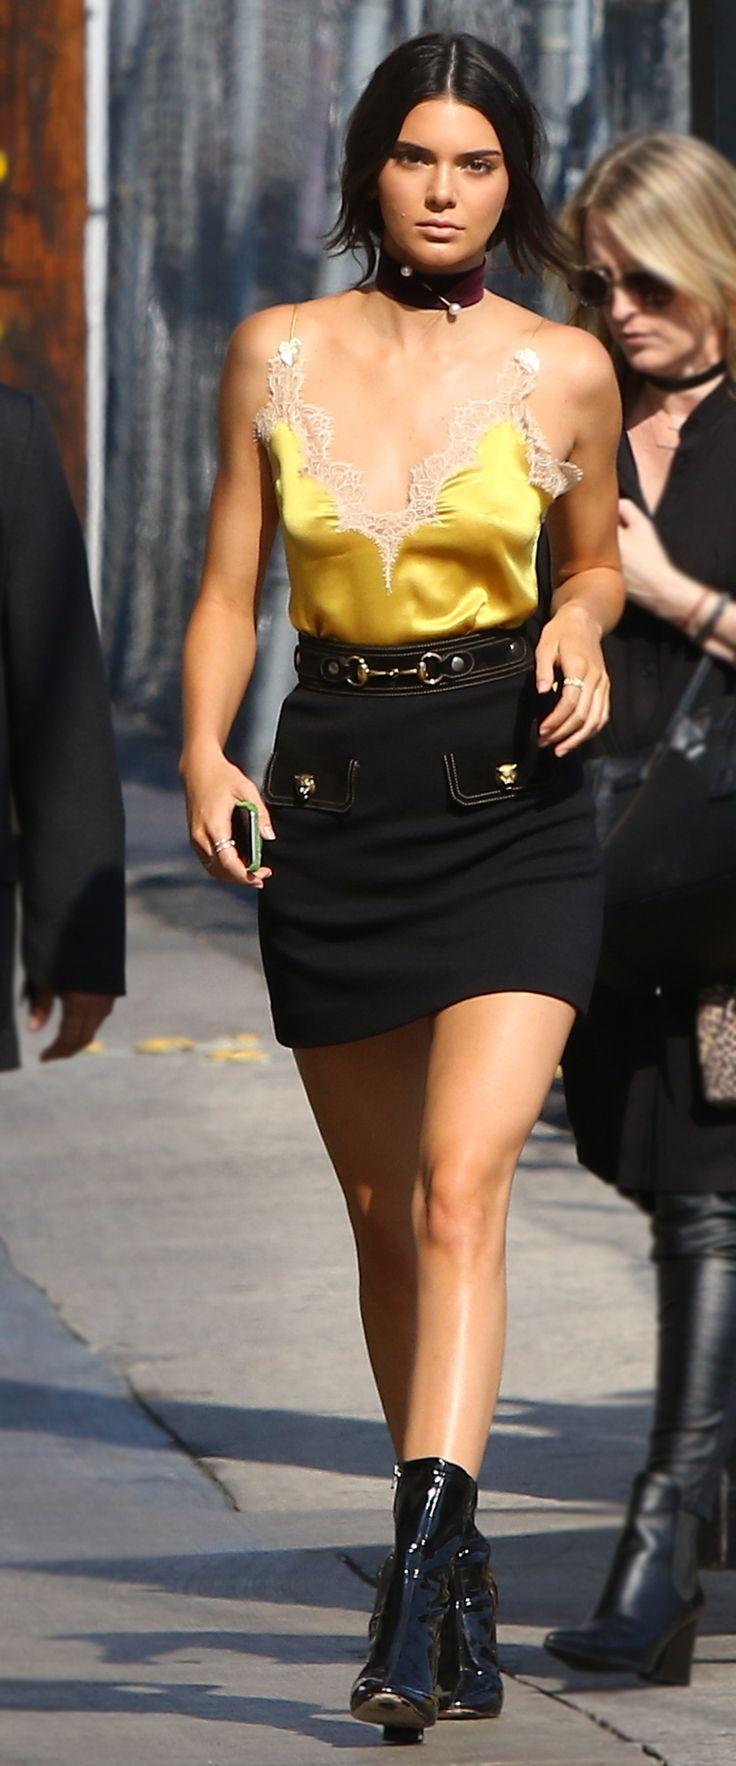 Look del día. Mustard cami+black mini skirt+black boots+choker. Late Summer Outfit 2016 Top lencero mostaza+mini falda de tuvo color negro+botines brillantes negros+maxi choker. Outfit de finales de verano 2016